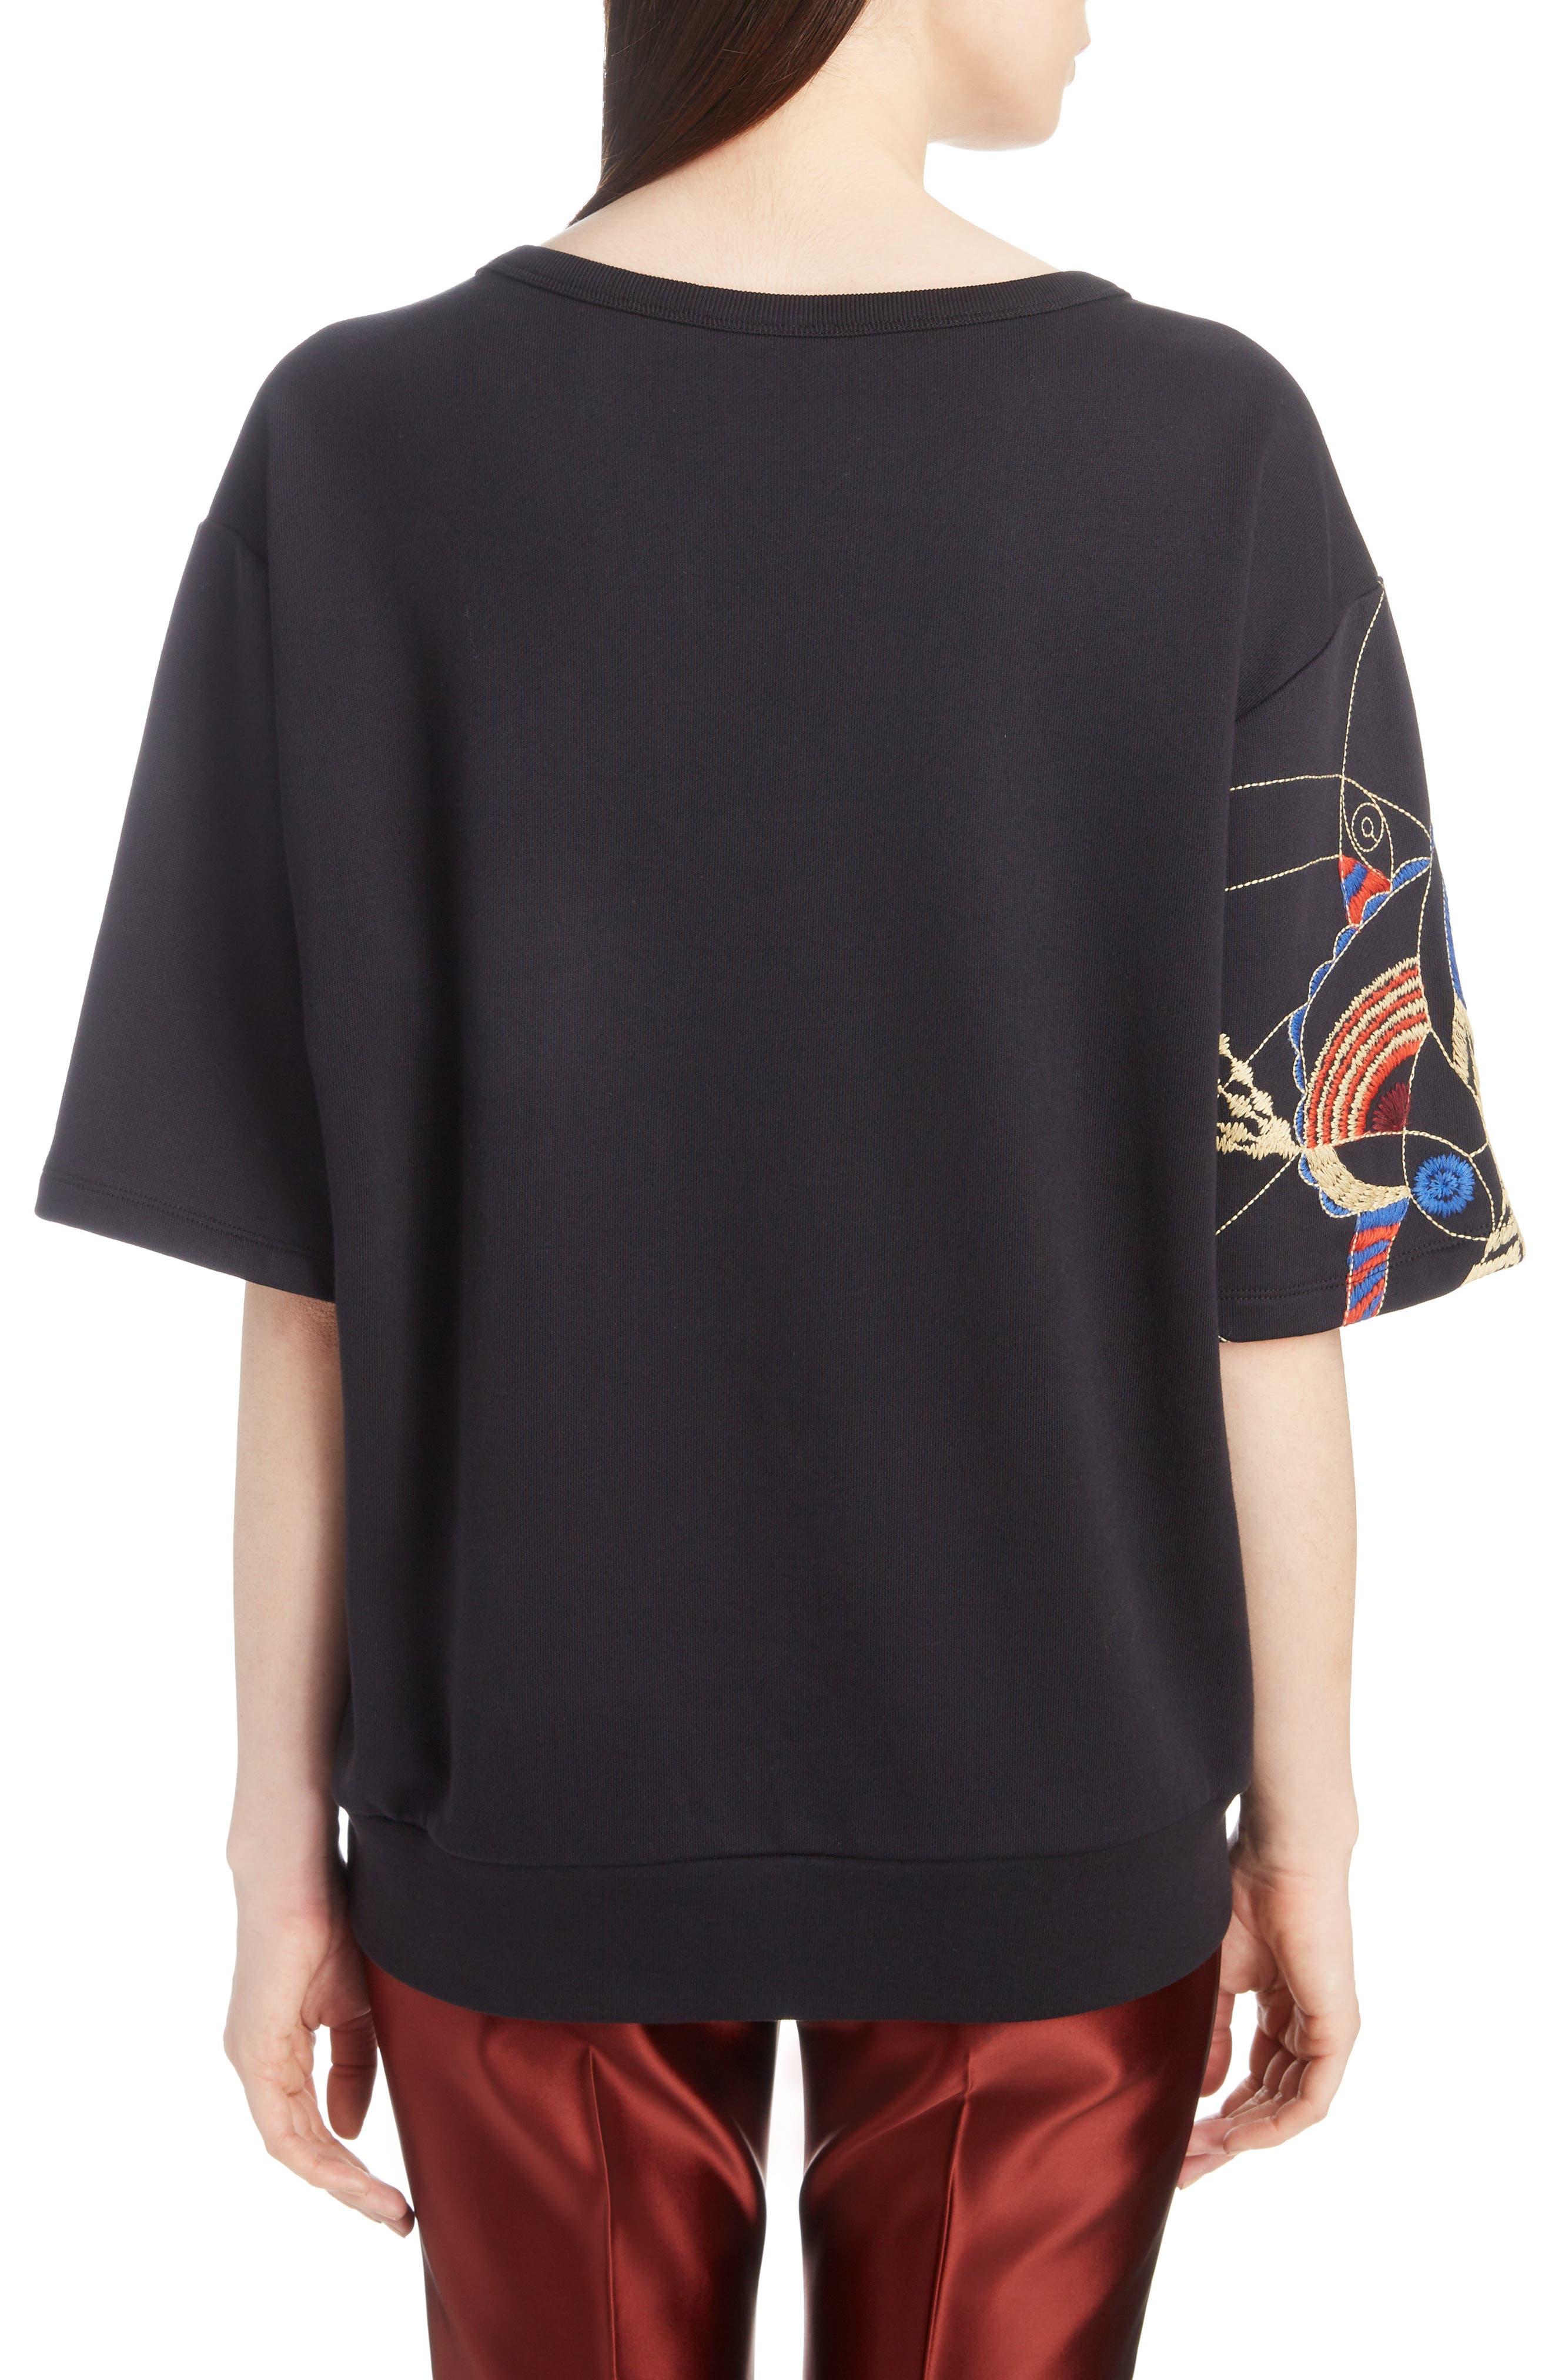 DRIES VAN NOTEN,                             Fan Embroidered Sweatshirt,                             Alternate thumbnail 2, color,                             001